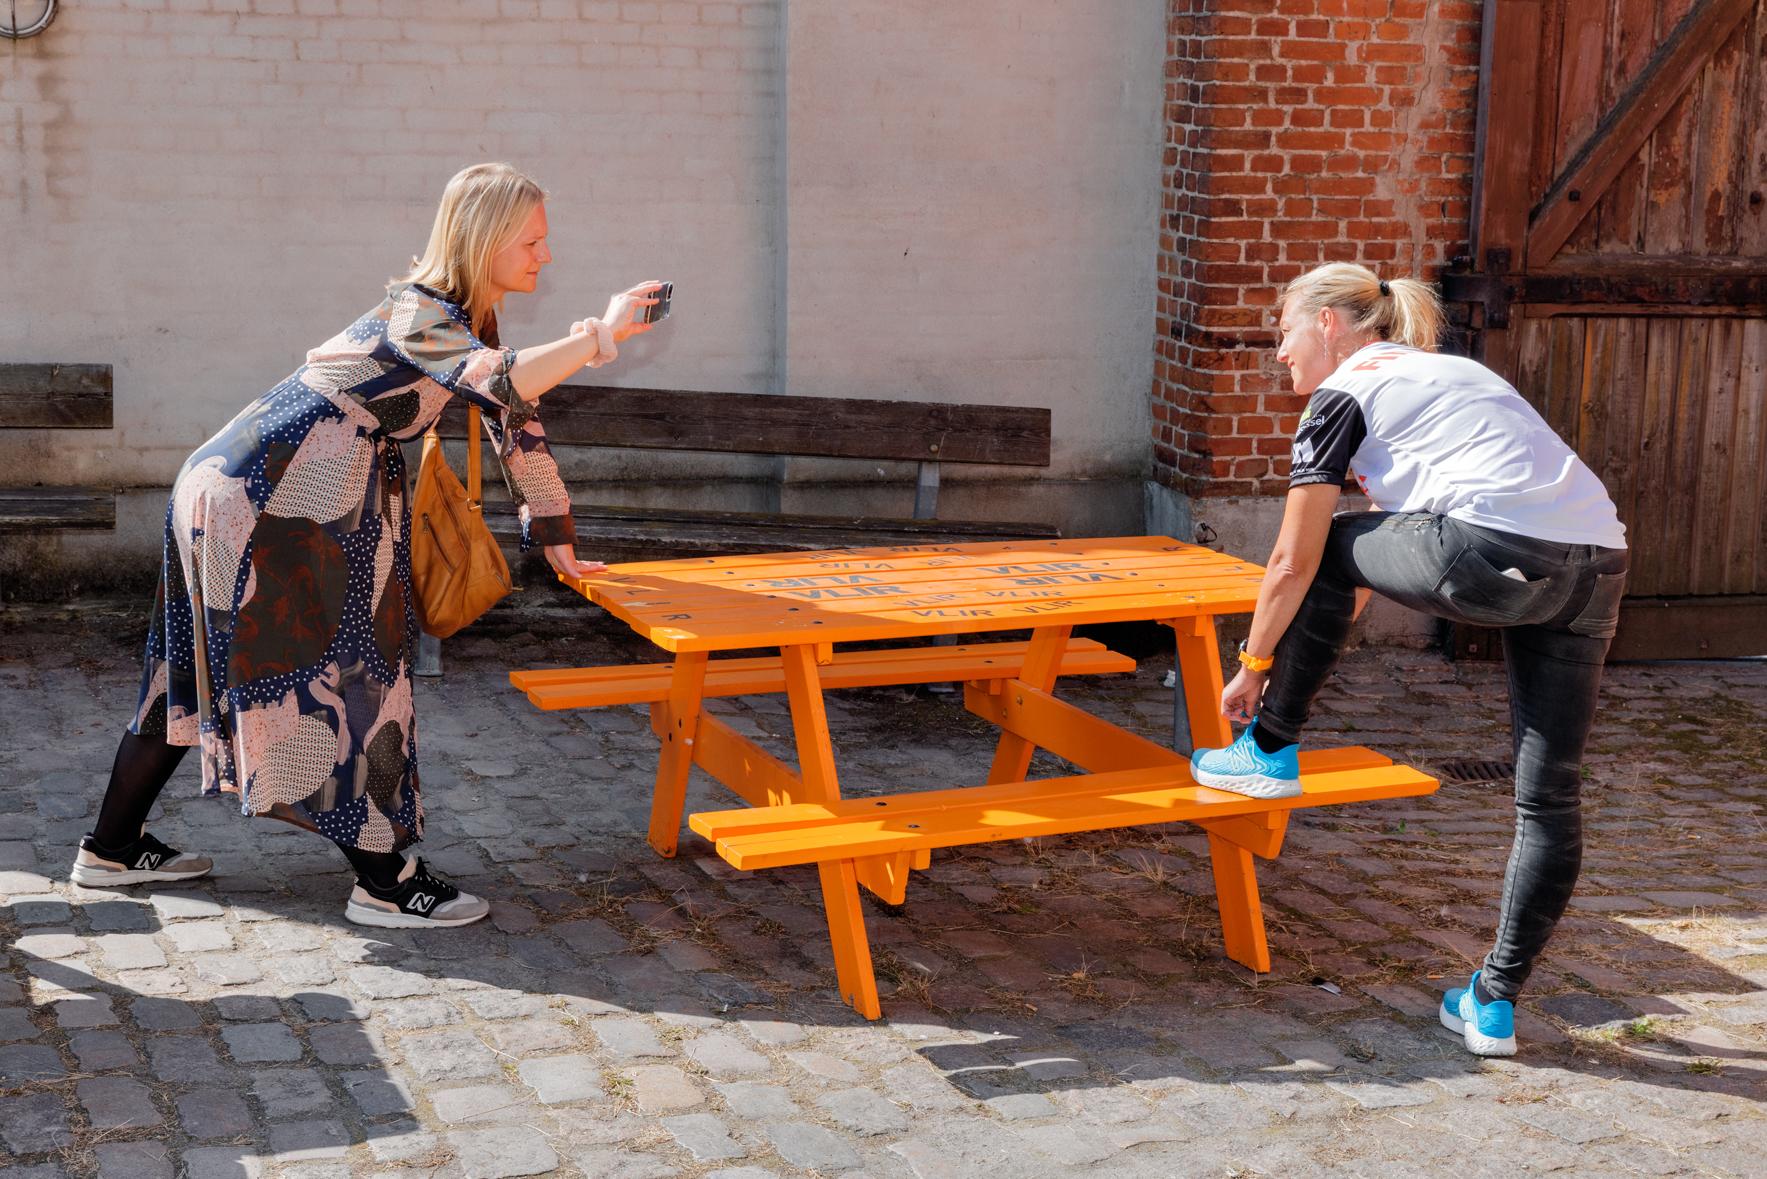 "<span class=""rodt"">Mere ungt, mindre støvet:</span> Nyt Randers-lokalmedie vil gå den ekstra mil 10"